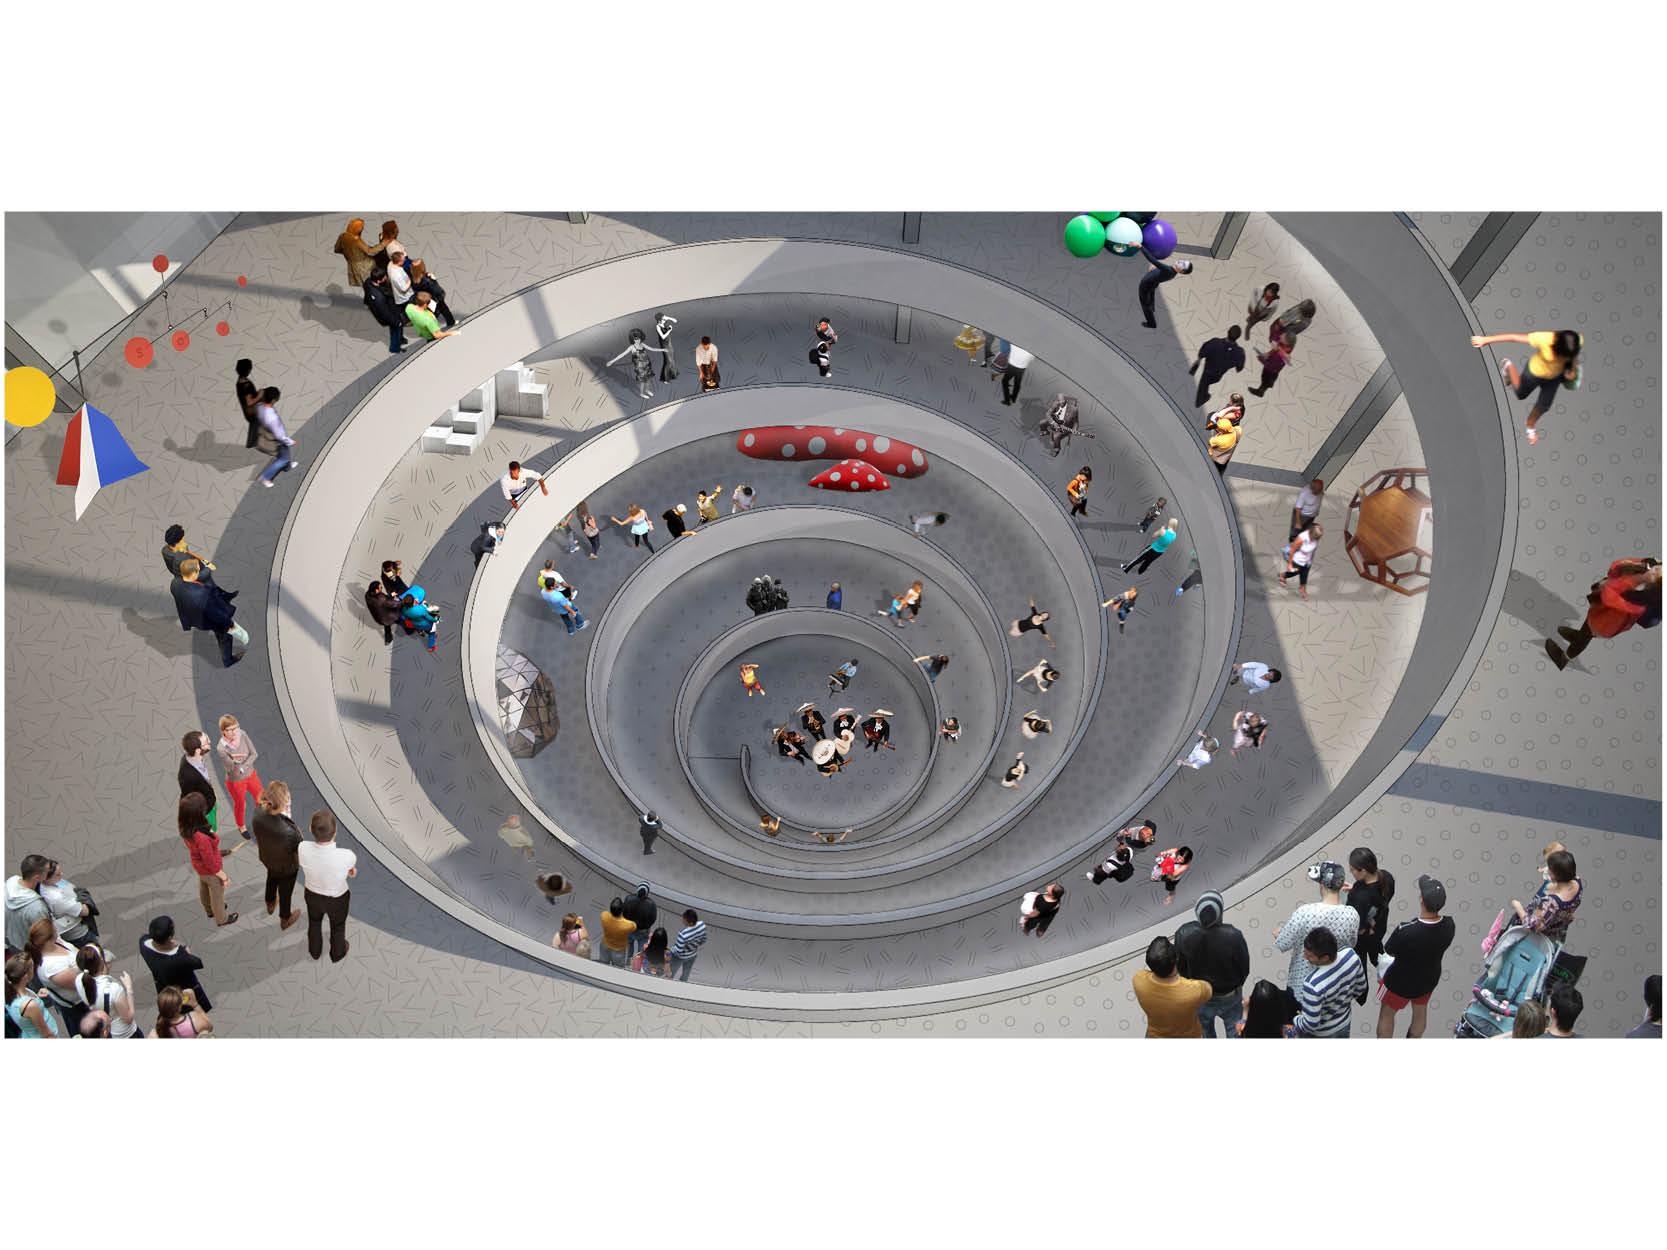 Parking Ramp and Spiral Arena